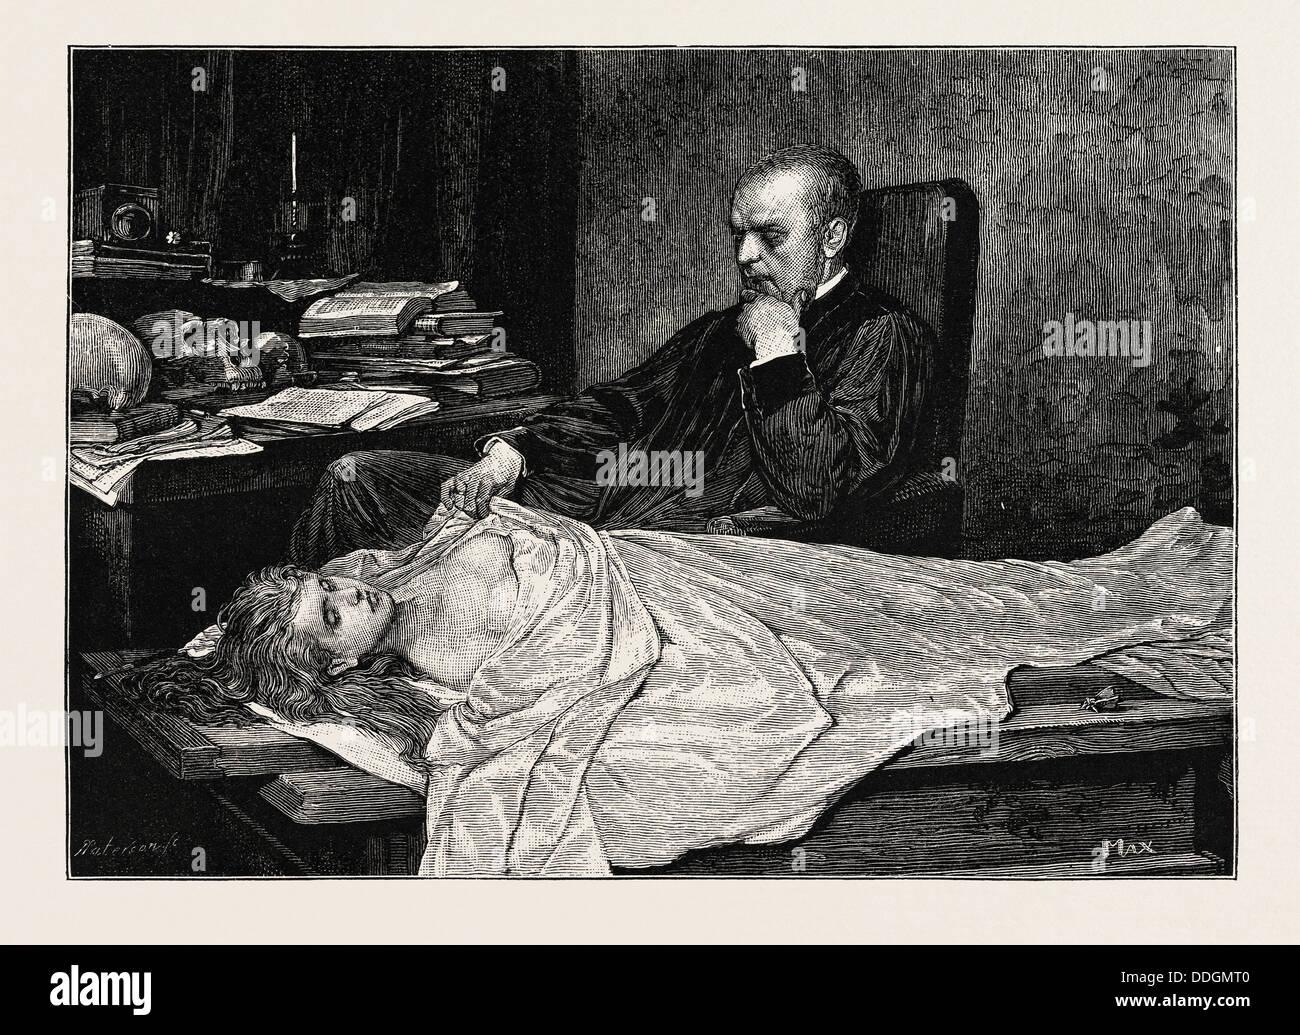 The Anatomist - Stock Image